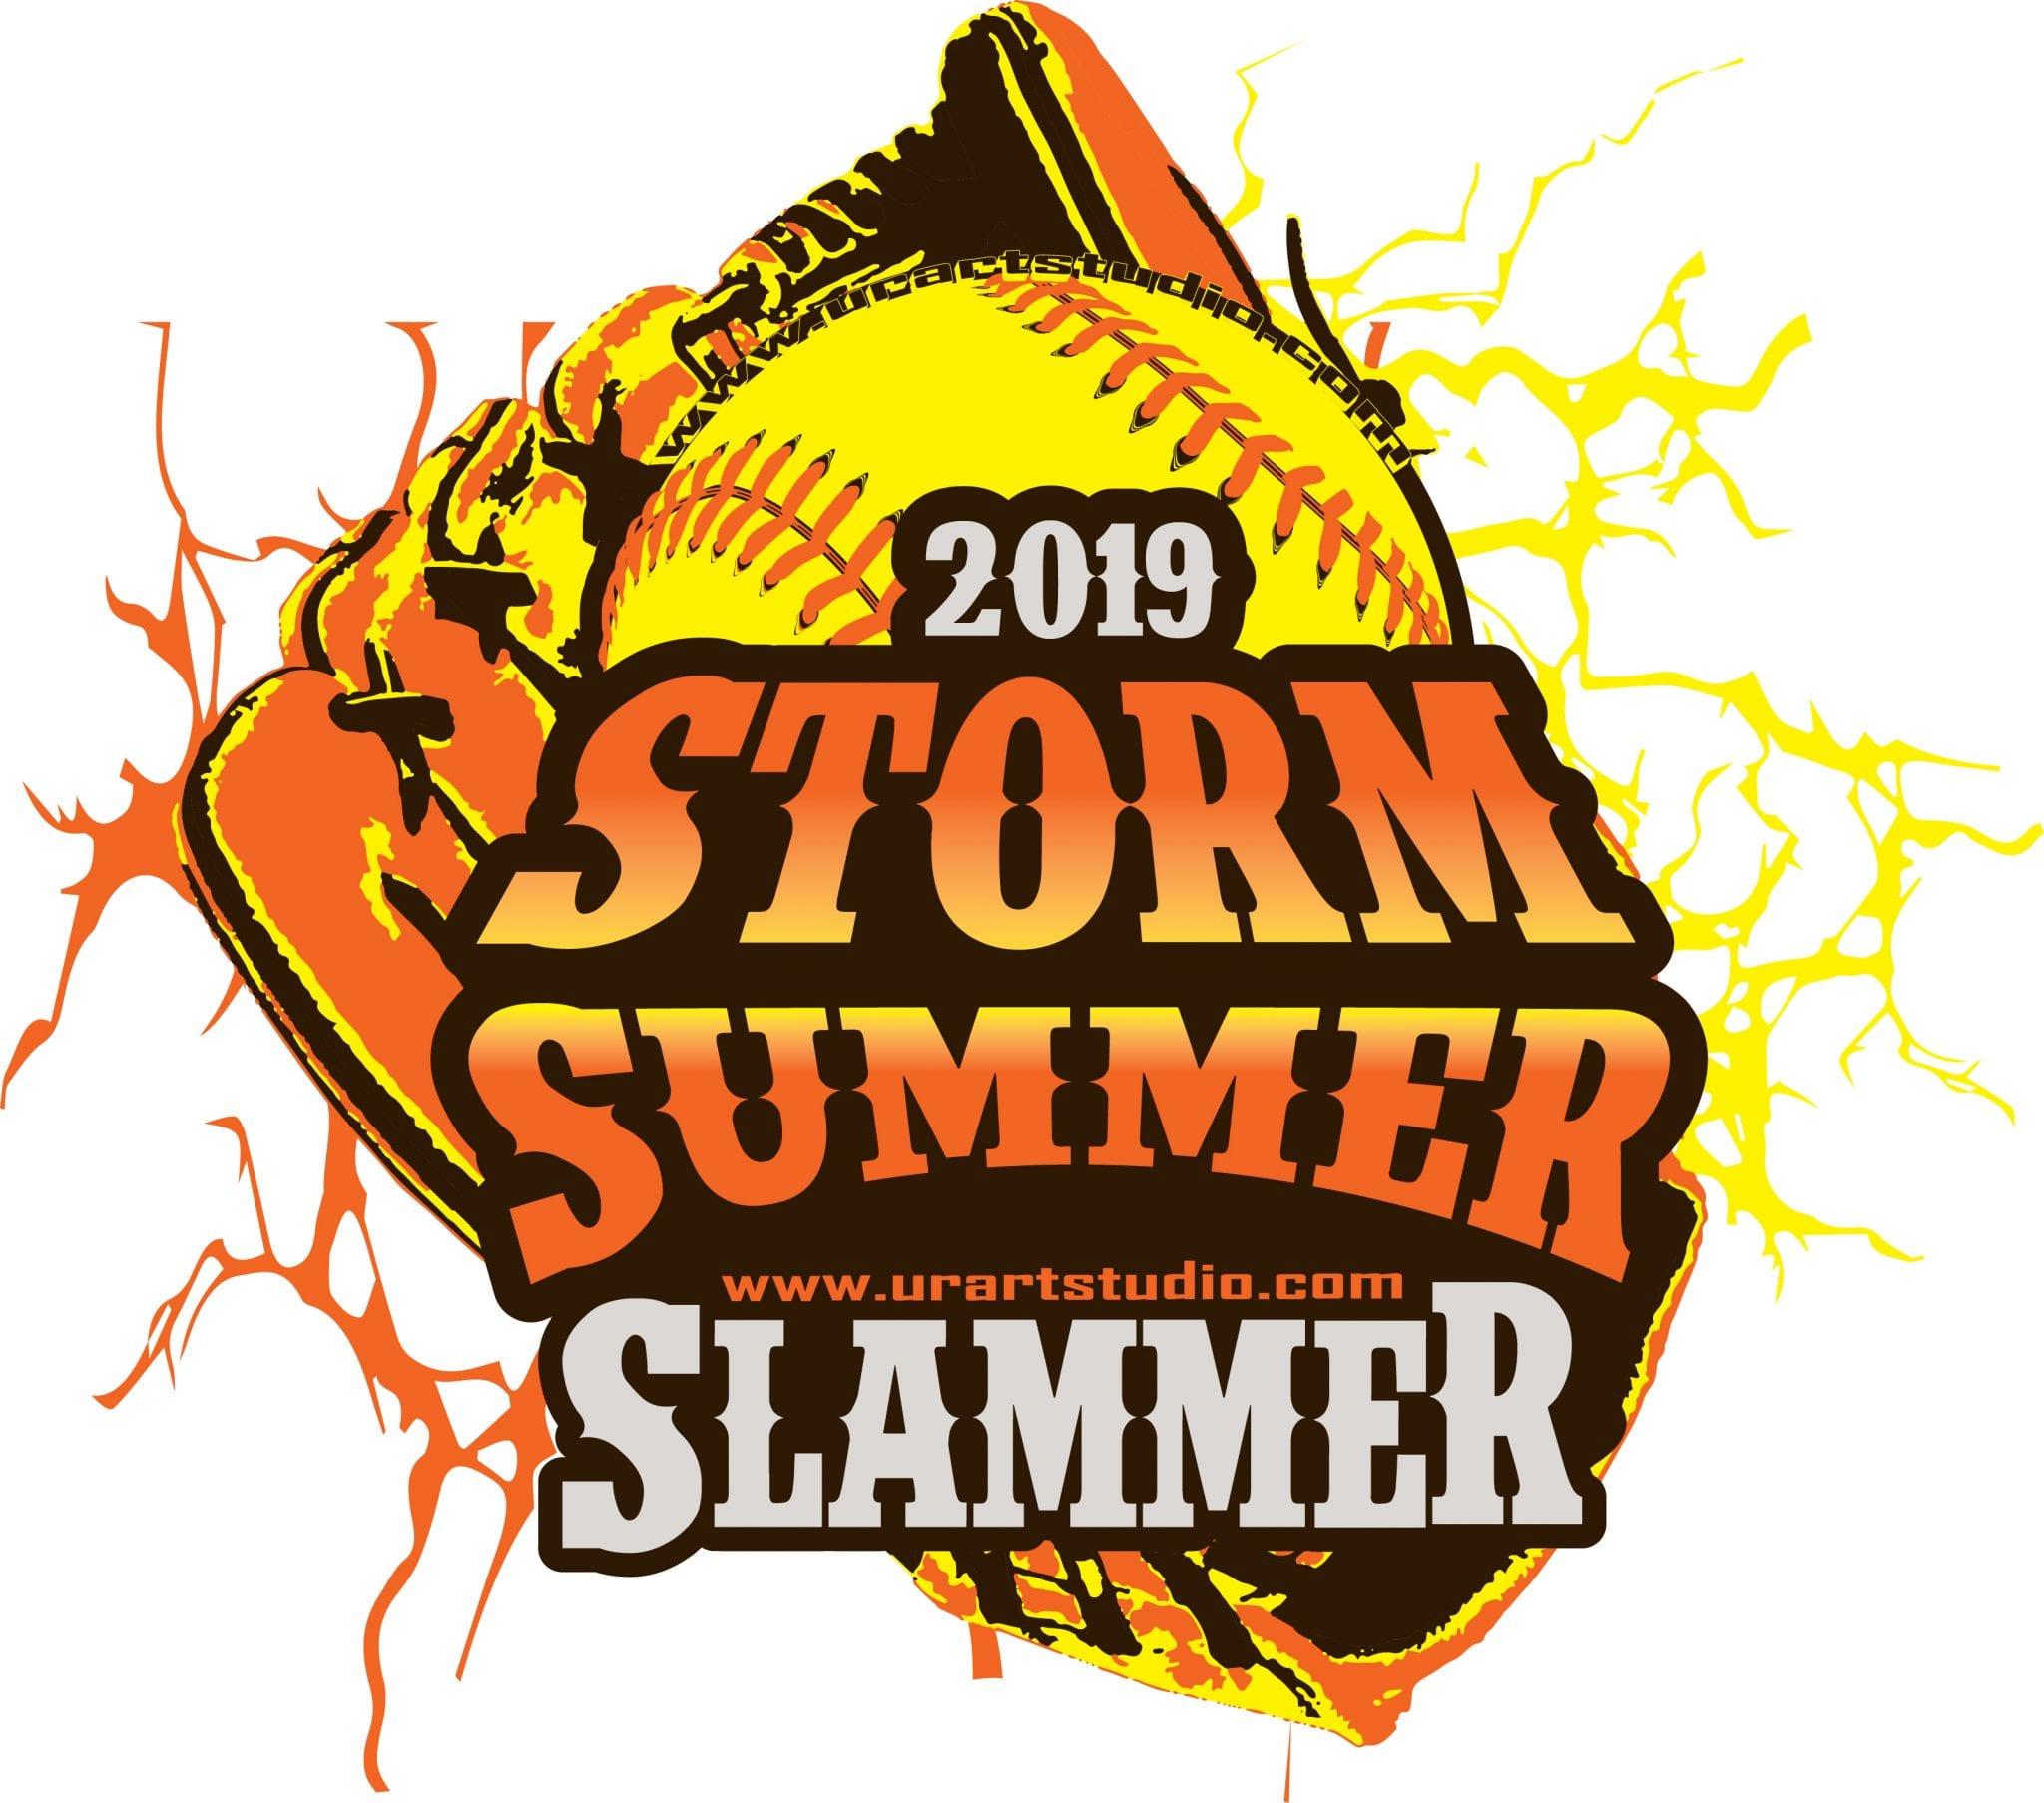 STORM SUMMER SLAMMER SOFTBALL customizable T-shirt vector logo design for print 2019